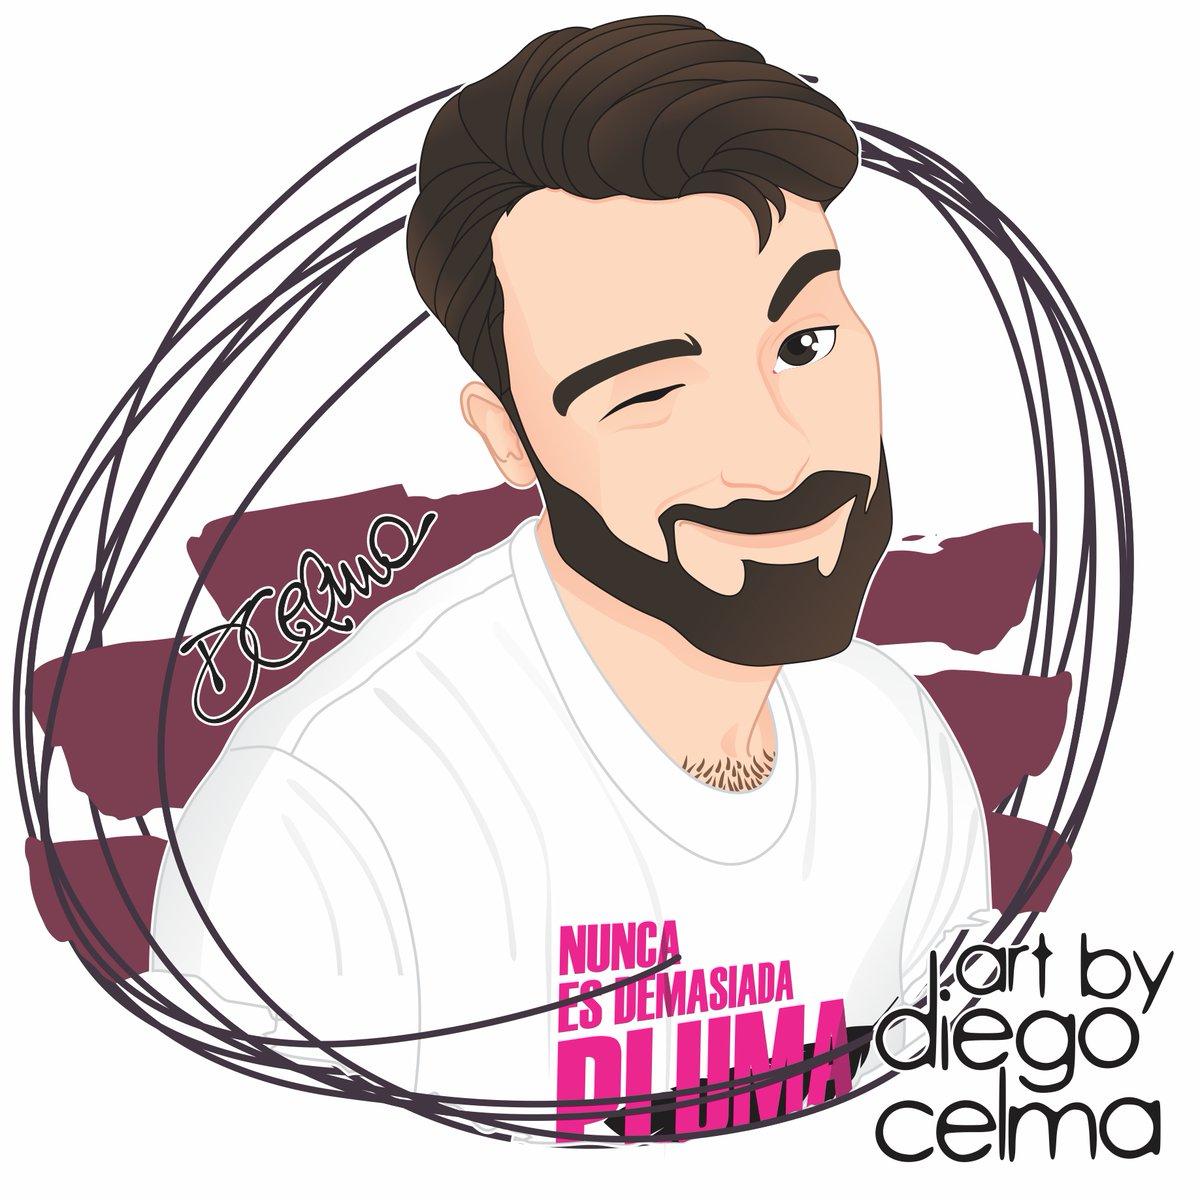 «Wingapo, maricones!» Spanish actor & youtuber @MrAvelain: dismantling prejudices with lots of laughs.  #artbyDiegoCelma #MrAvelain #AvelinoPiedad #portrait #actor #youtuber #socialmedia #comedy #activist #gay #spanish #illustration #drawing #art #fanart #artwork https://t.co/uKlmyZ3bMR